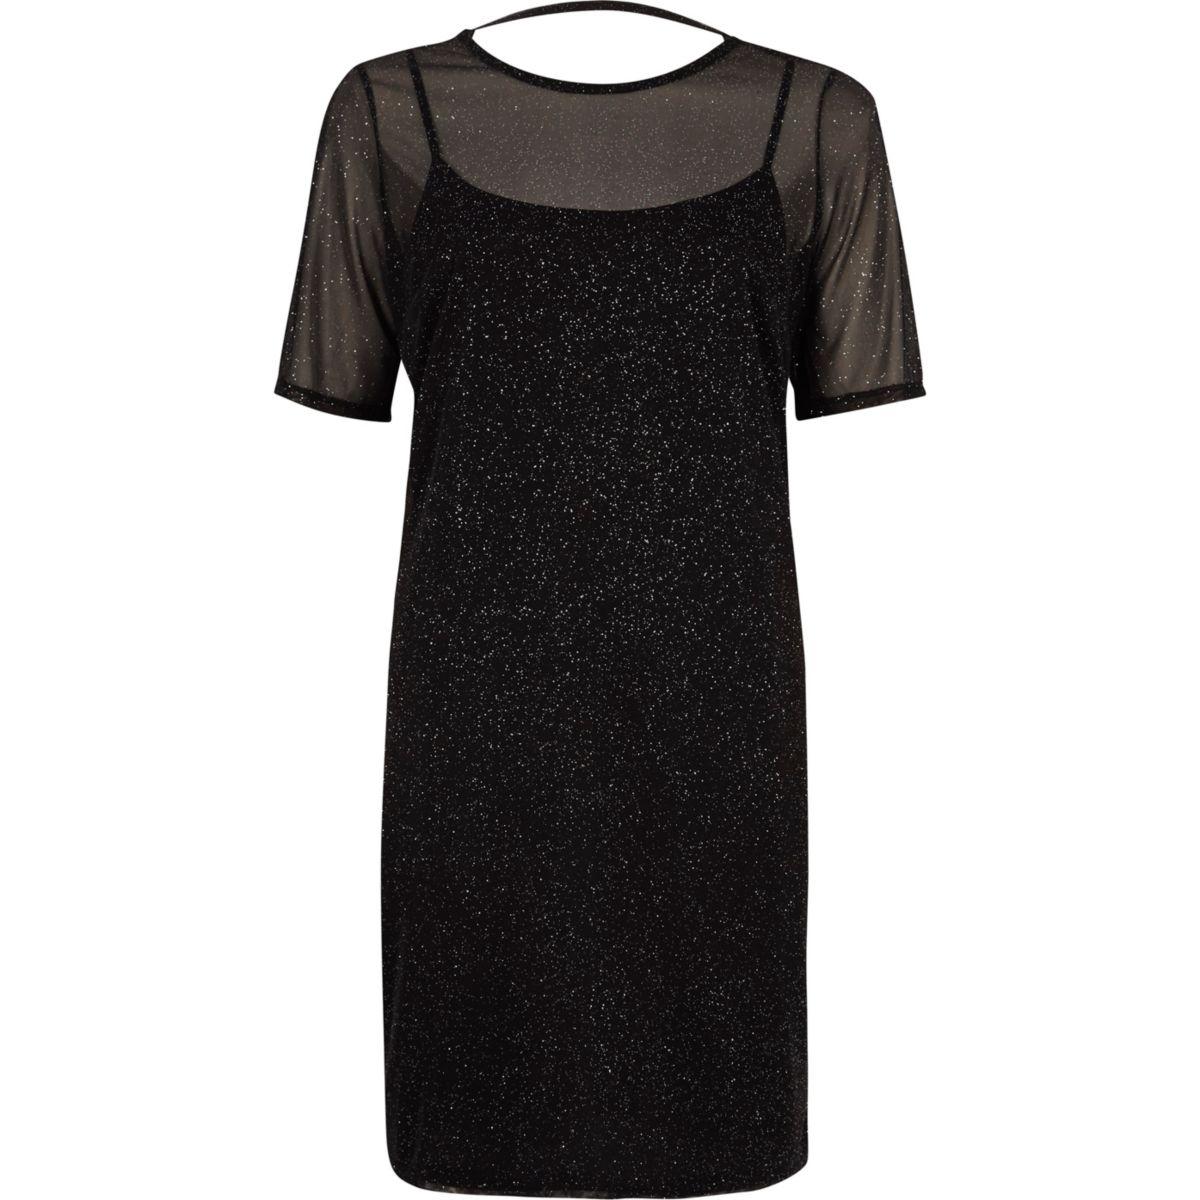 Black glitter mesh T-shirt dress